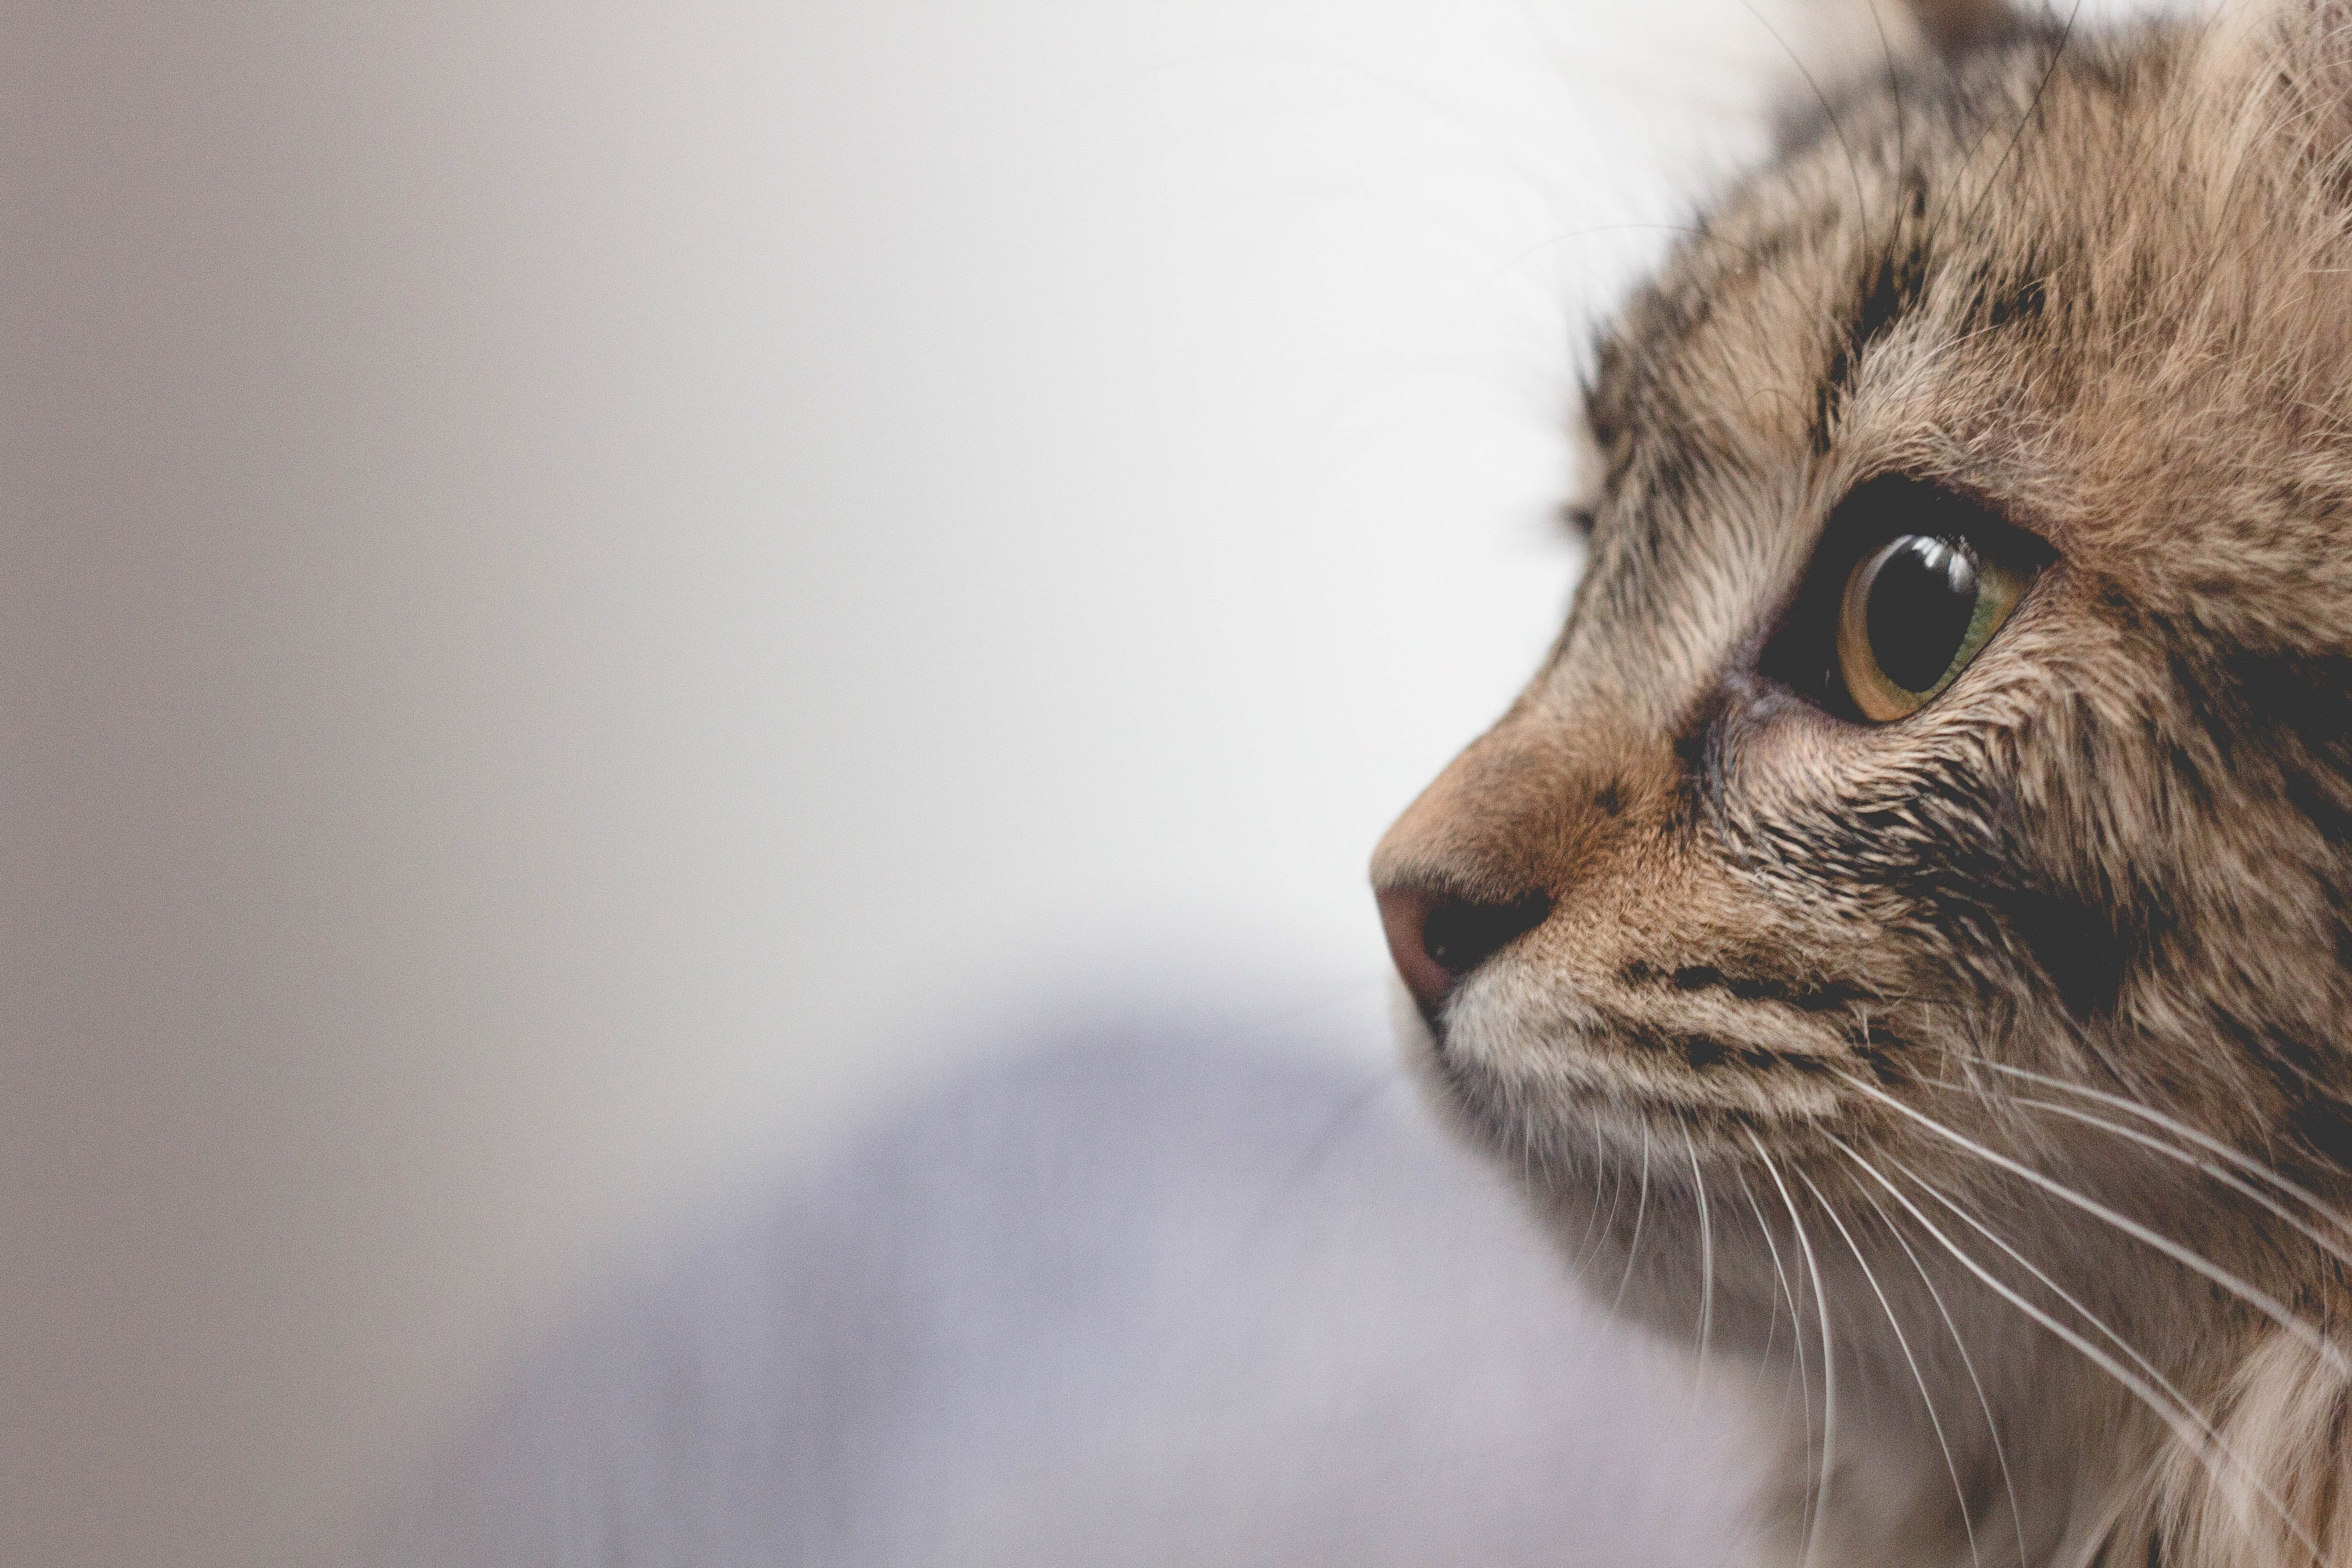 wellness-5-common-eye-problems-in-elderly-cats-hero-image